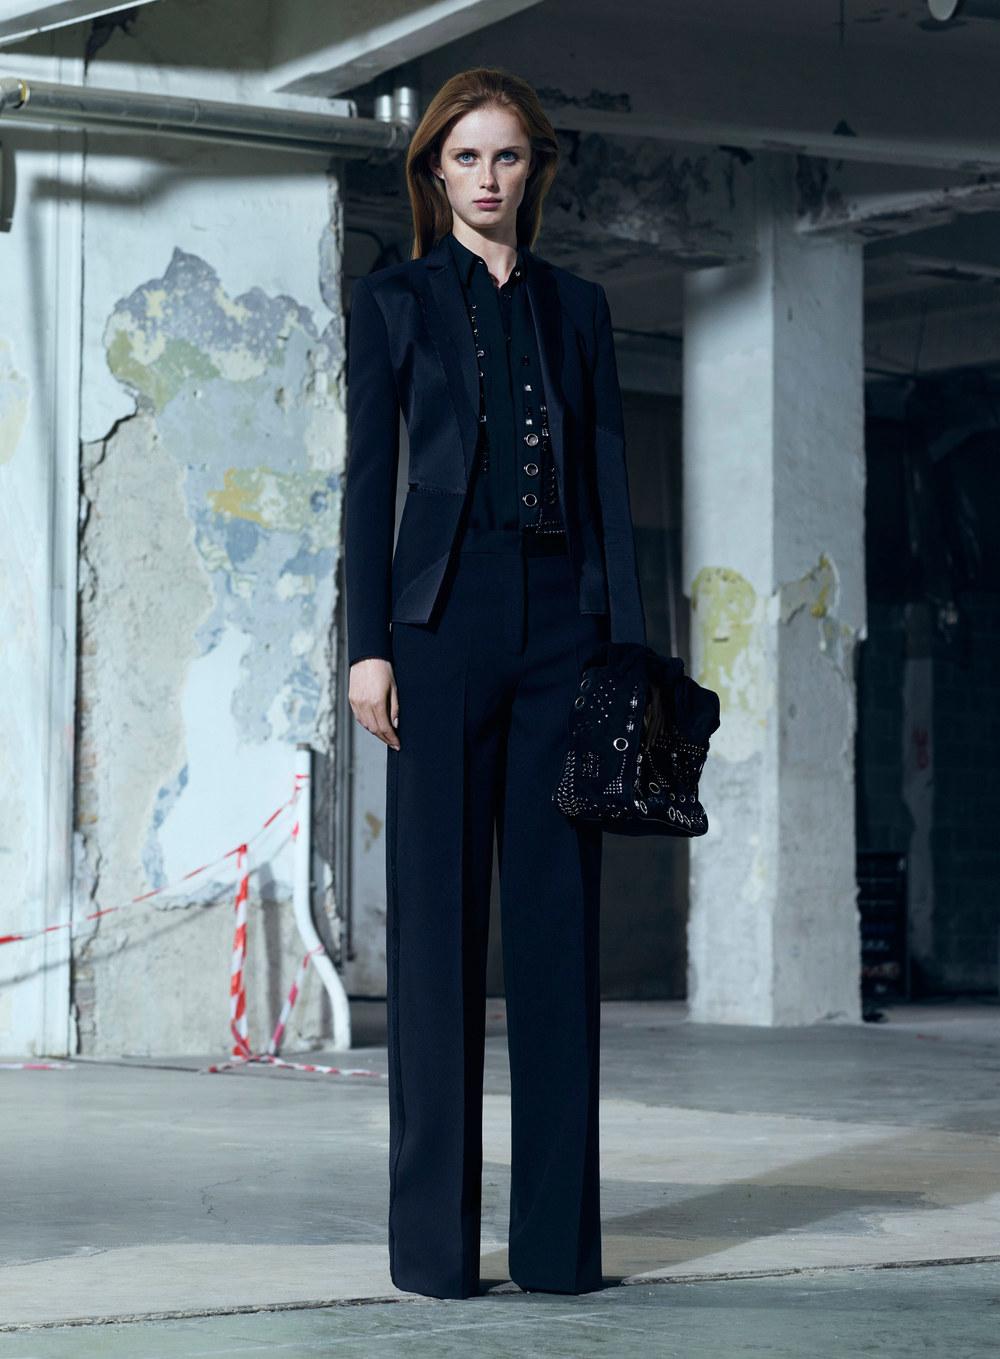 versace-pre-fall-2016-lookbook-36.jpg